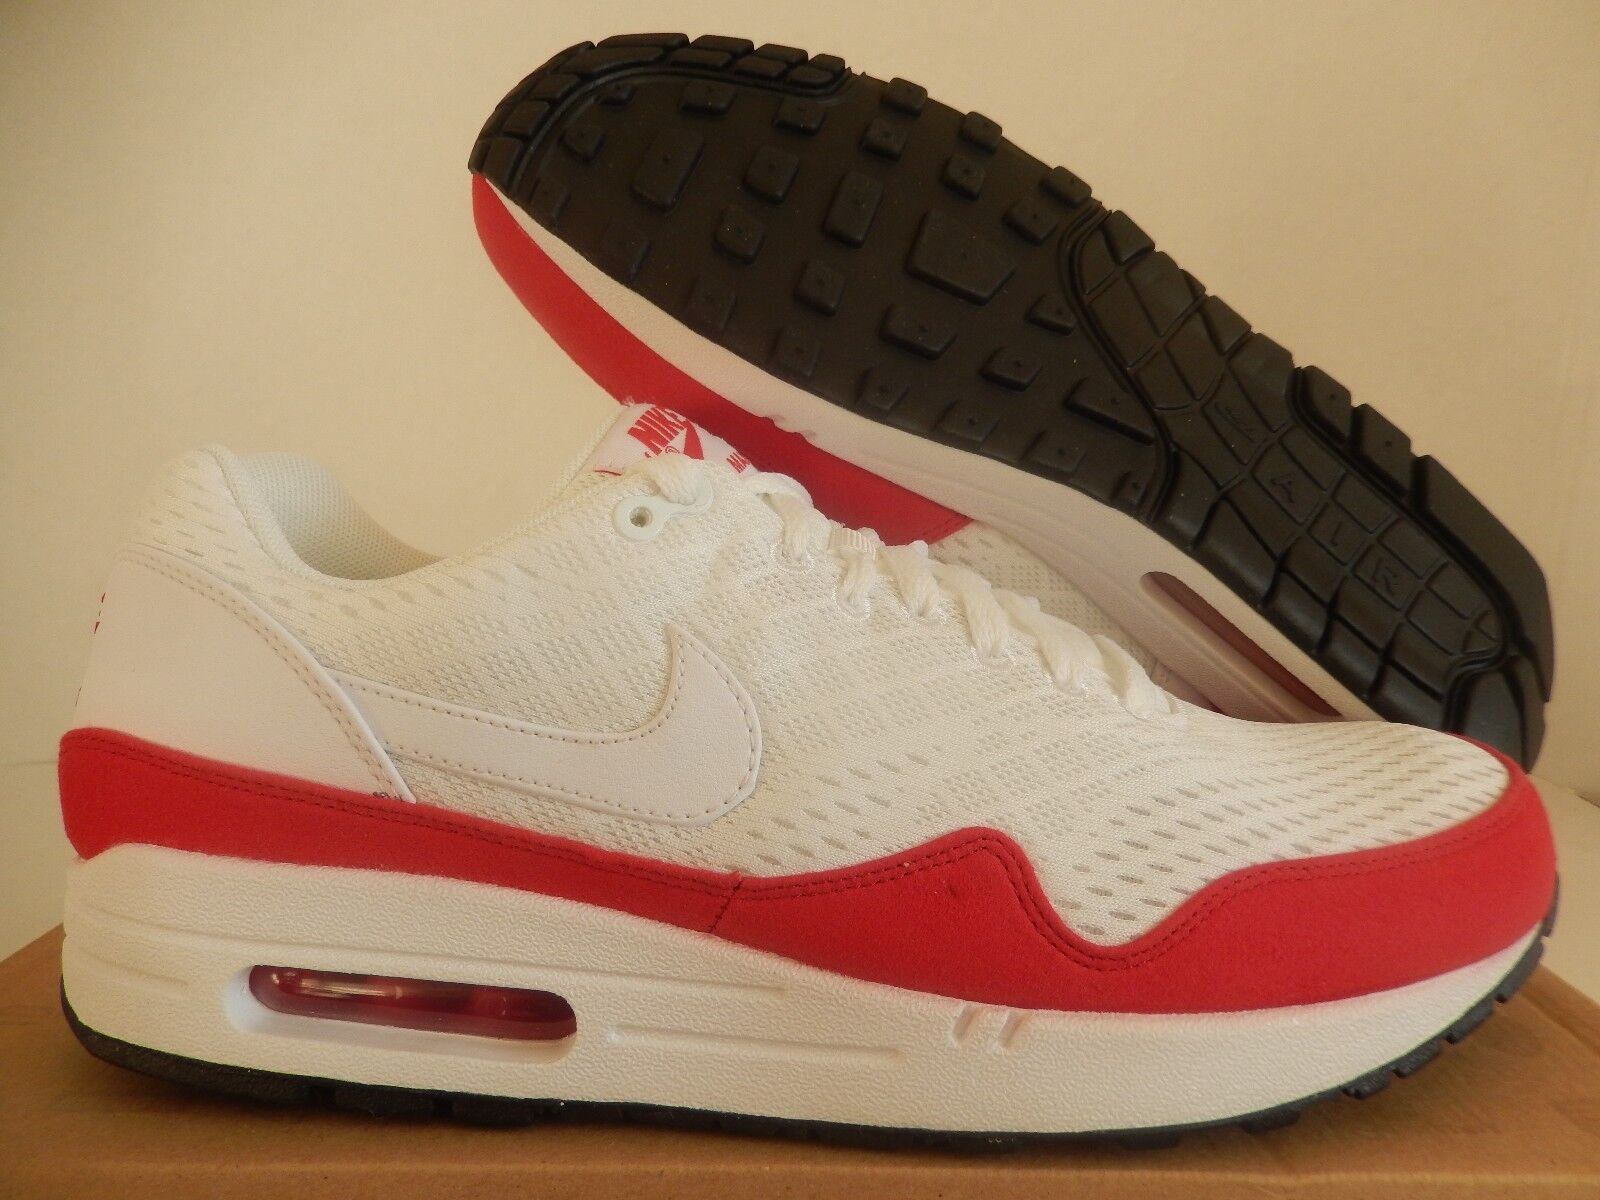 Nike air max 1 em maglie white-university red sz 10 raro!- 554718-161]